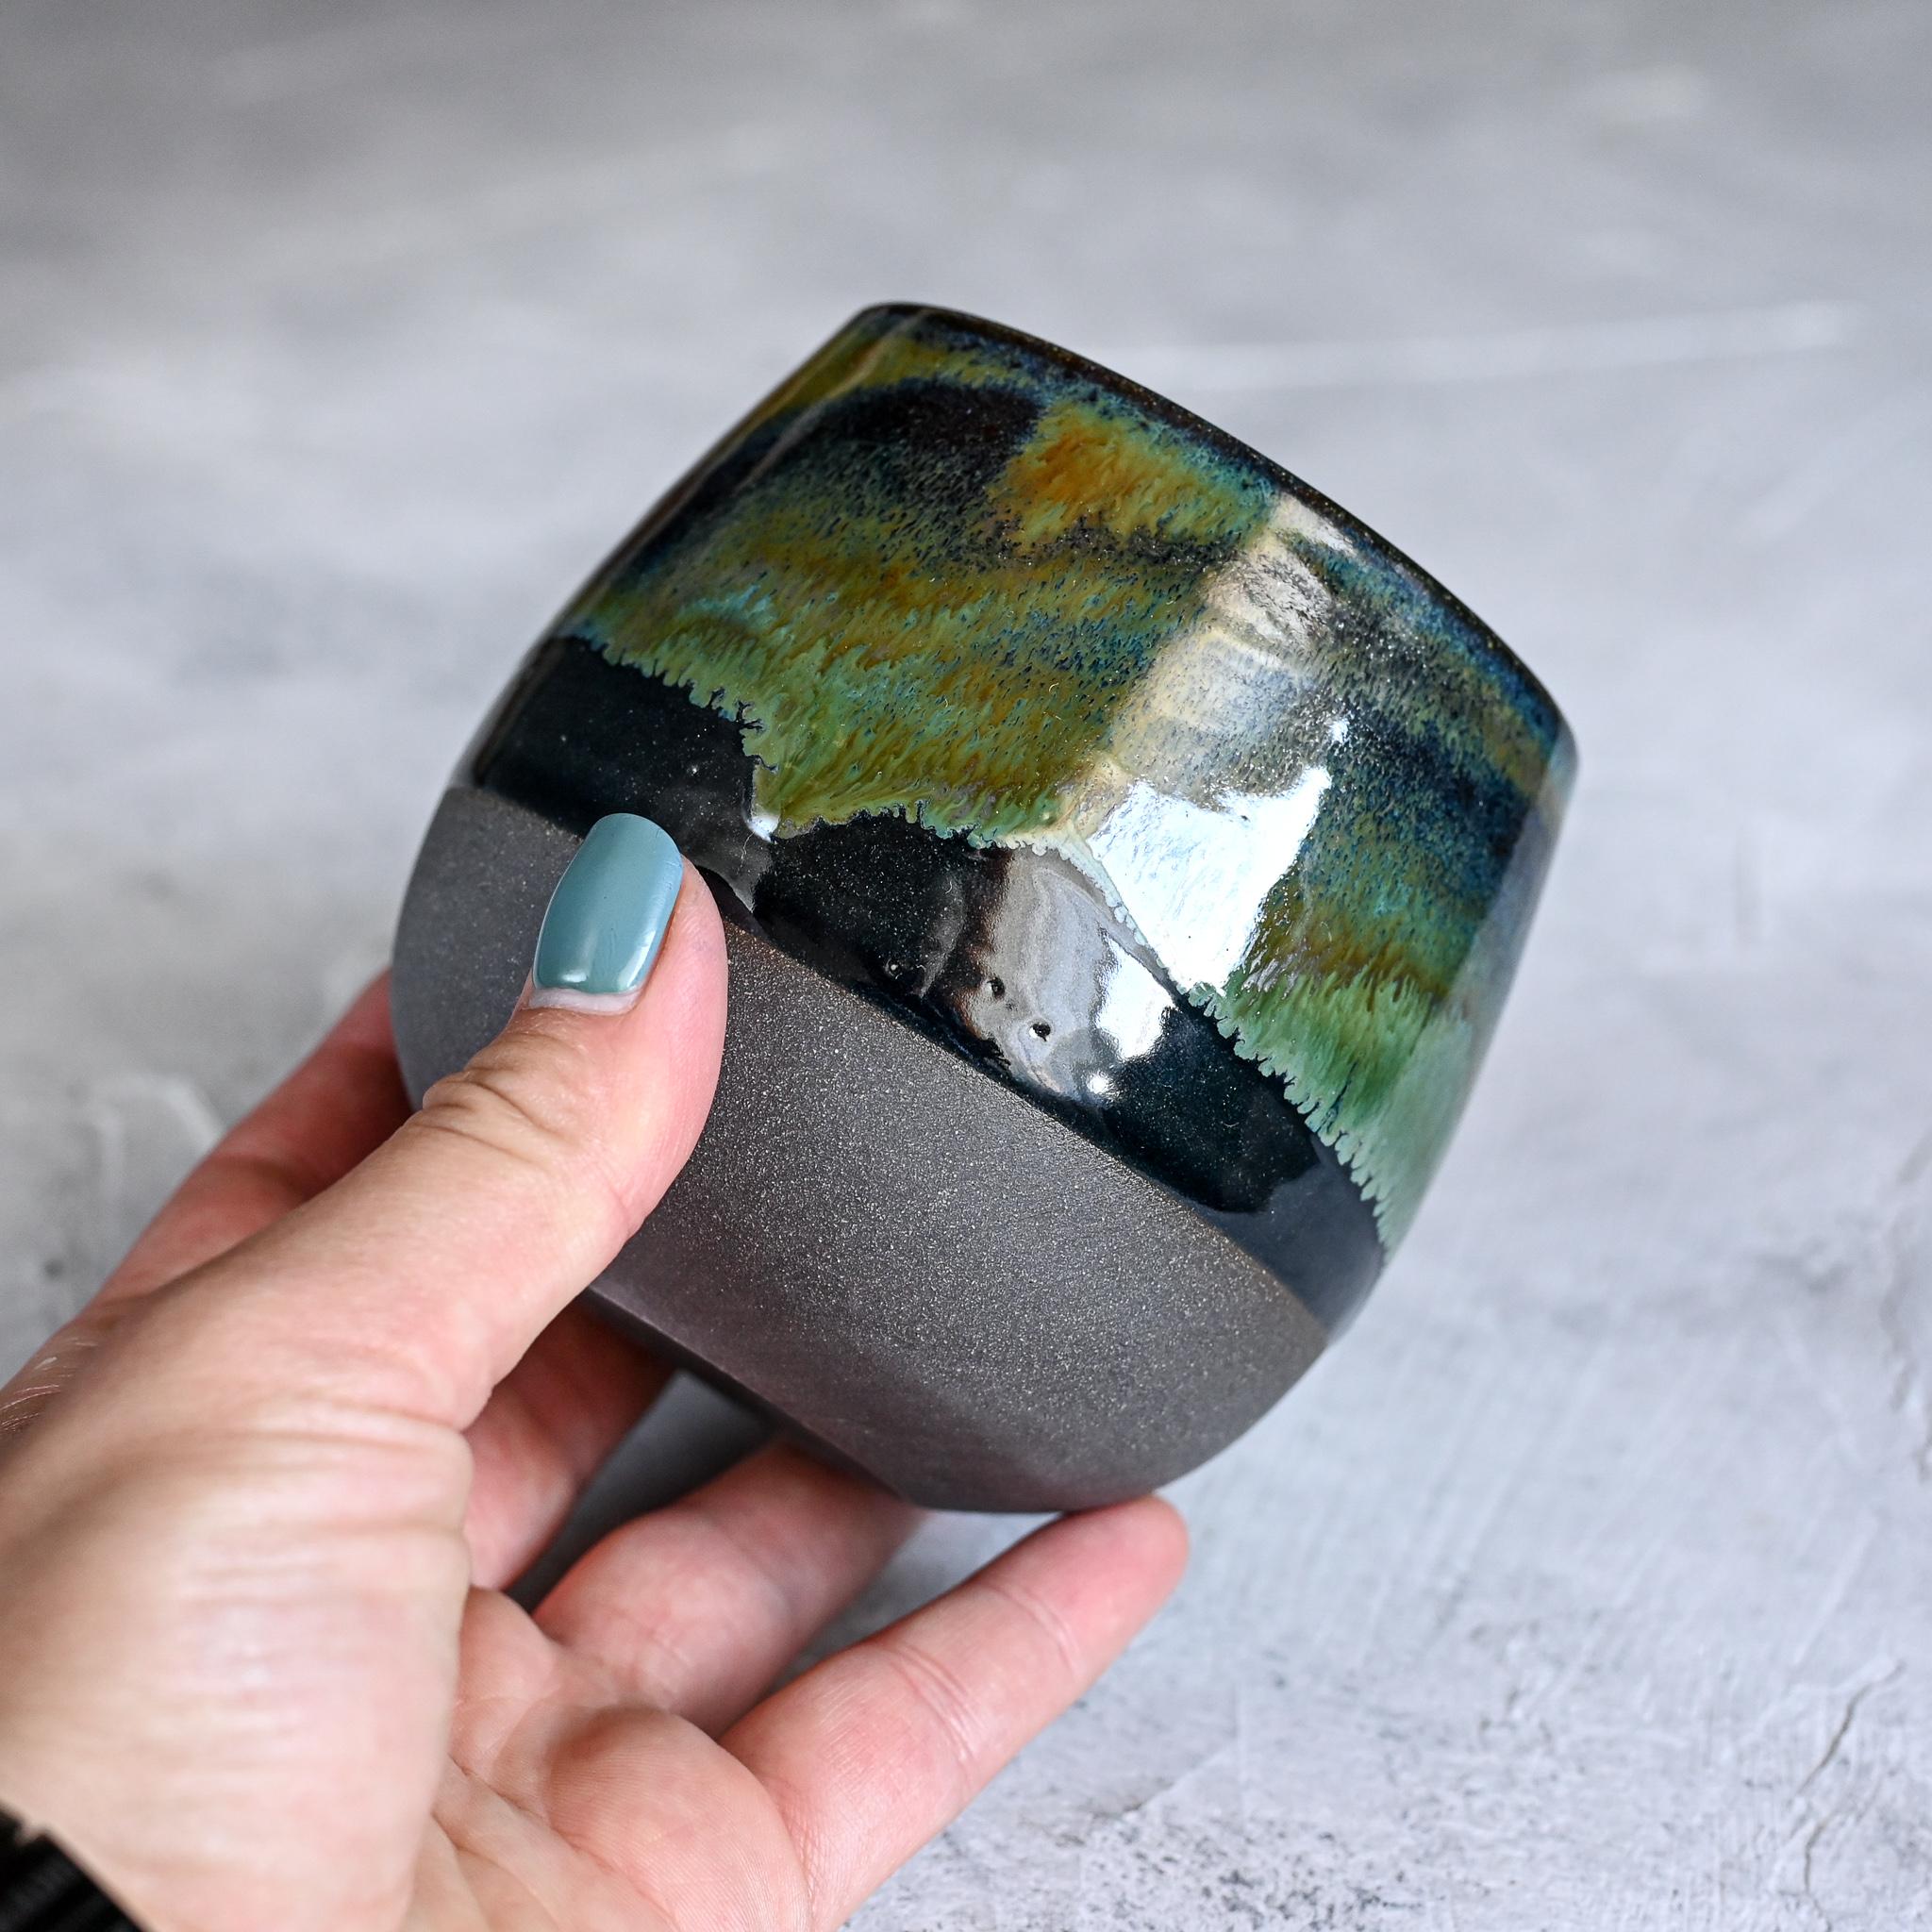 картинка Керамический стакан Марии Левиной 22 - DishWishes.Ru